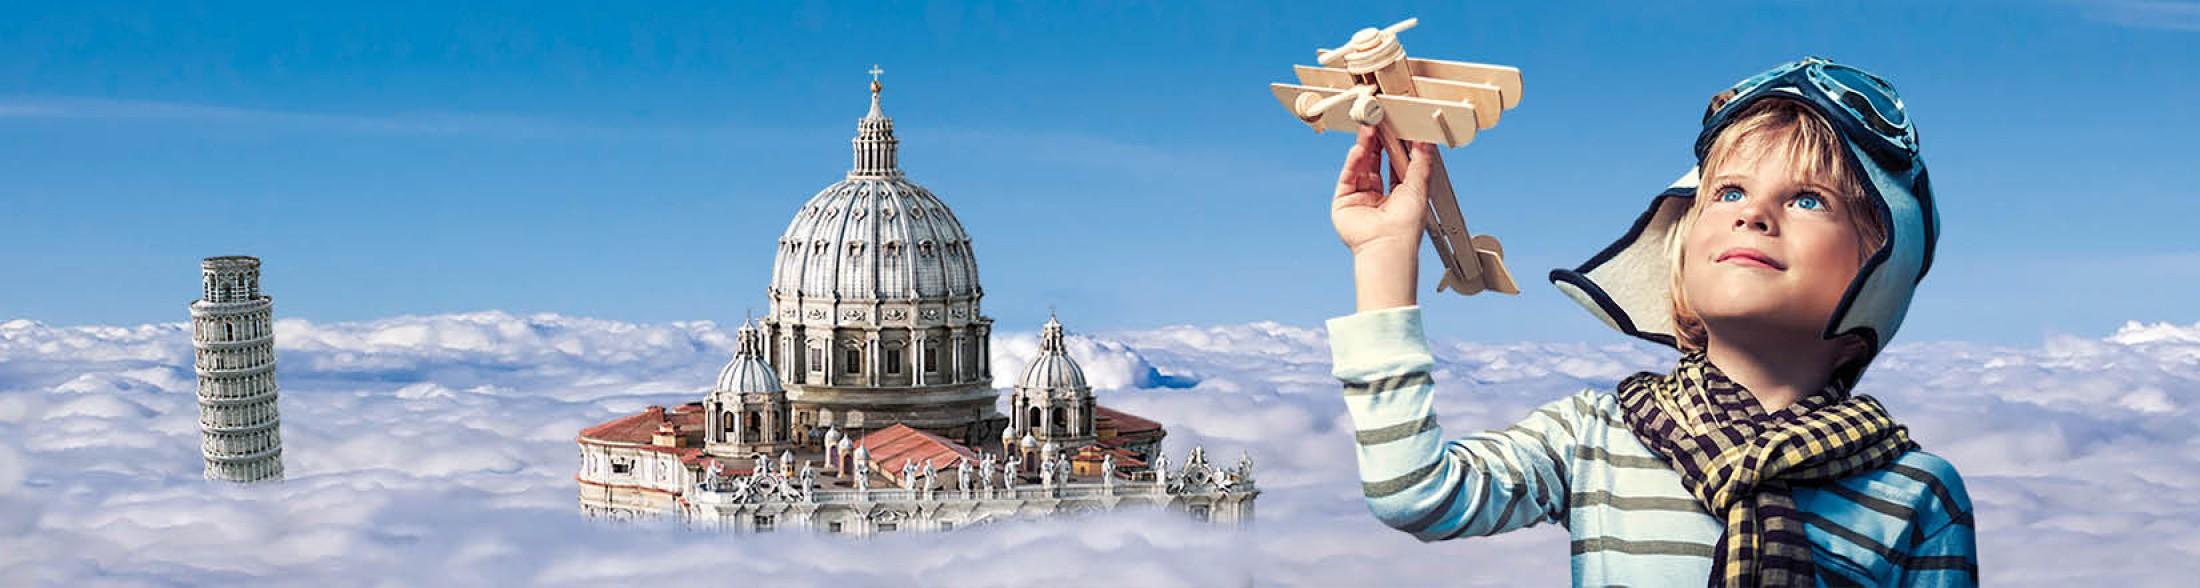 Italia in Miniatura Bambino aeroplano